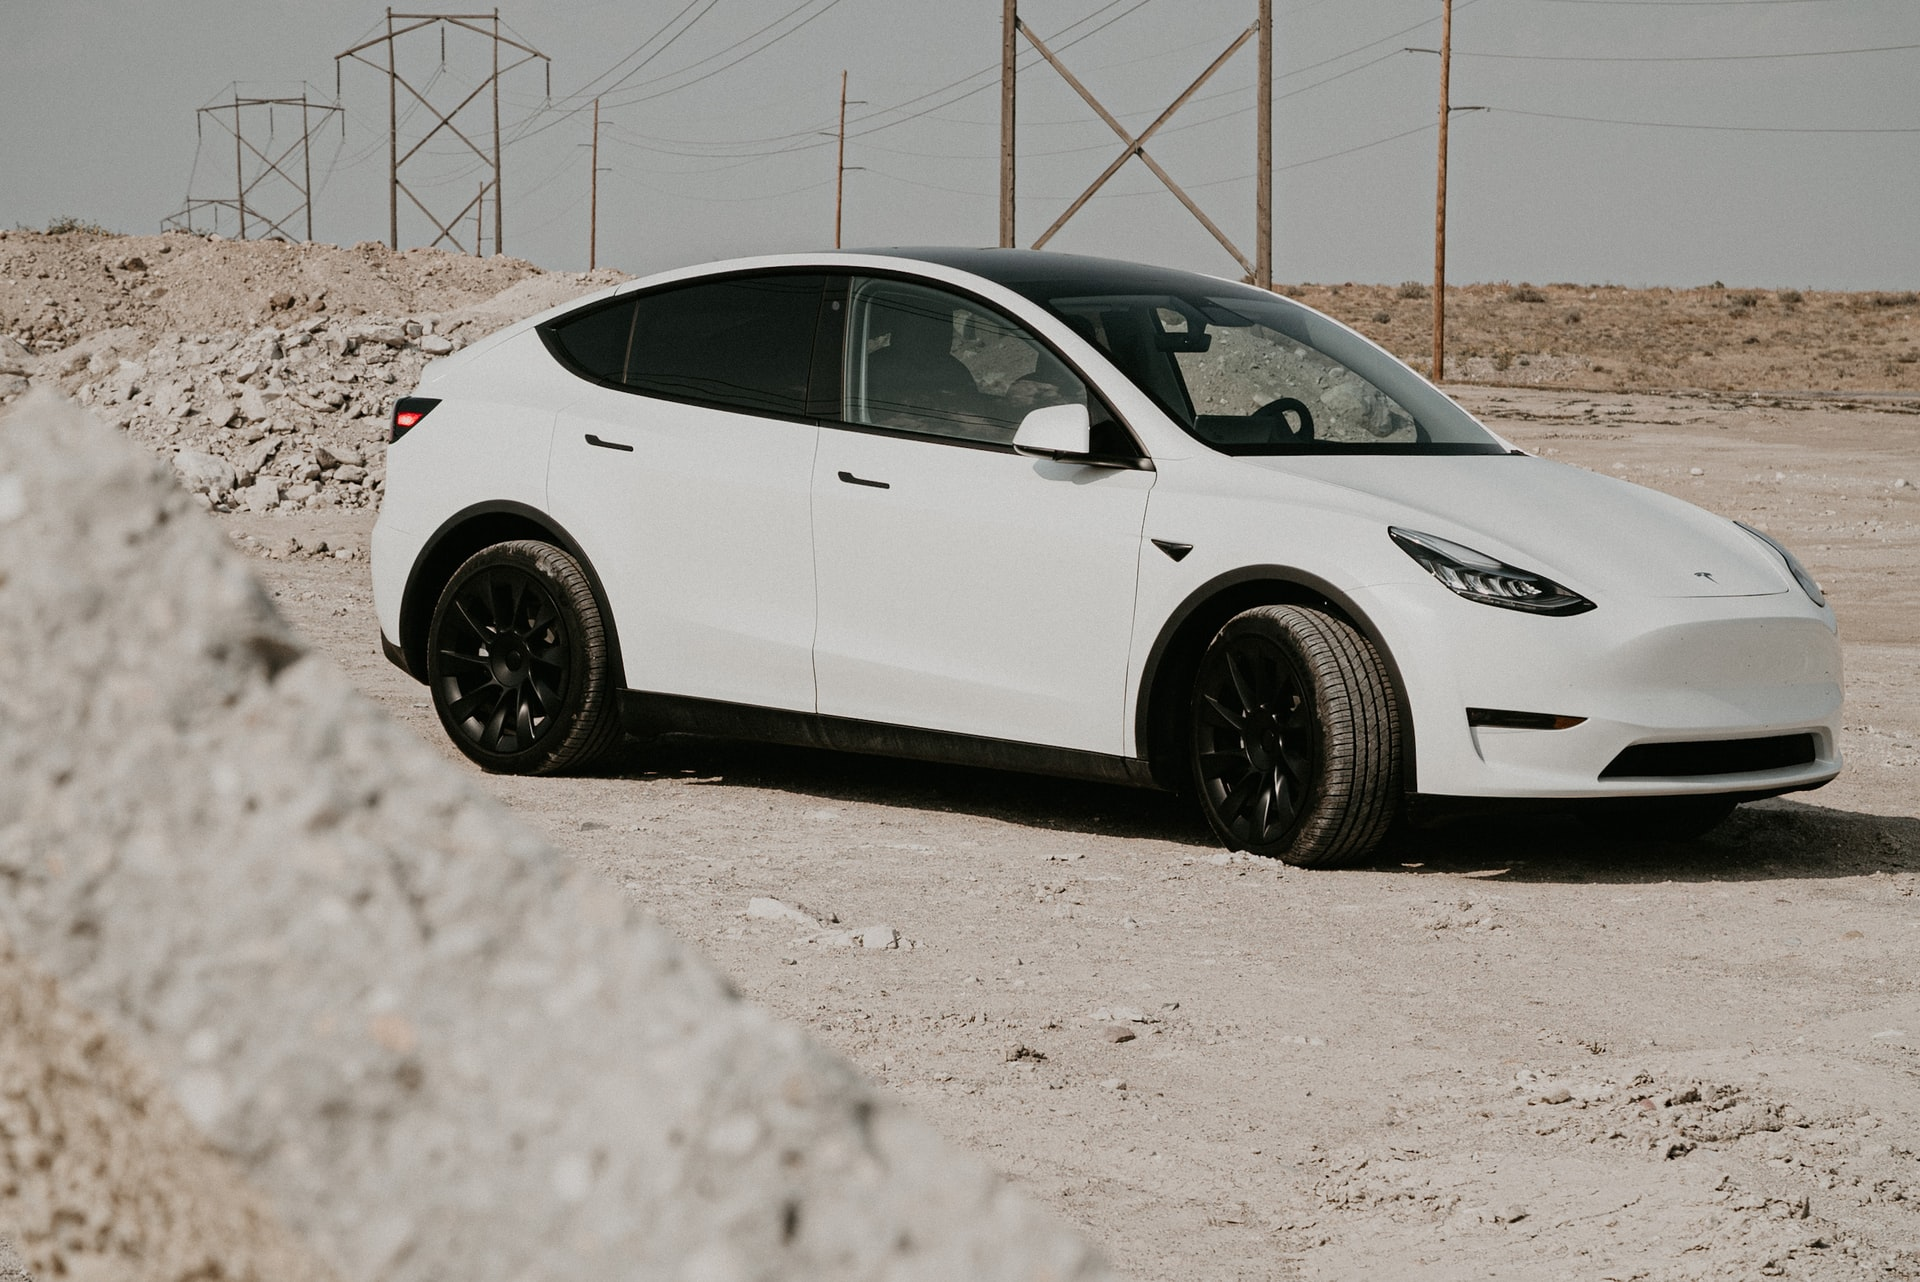 Un Tesla Model Y de couleur blanche